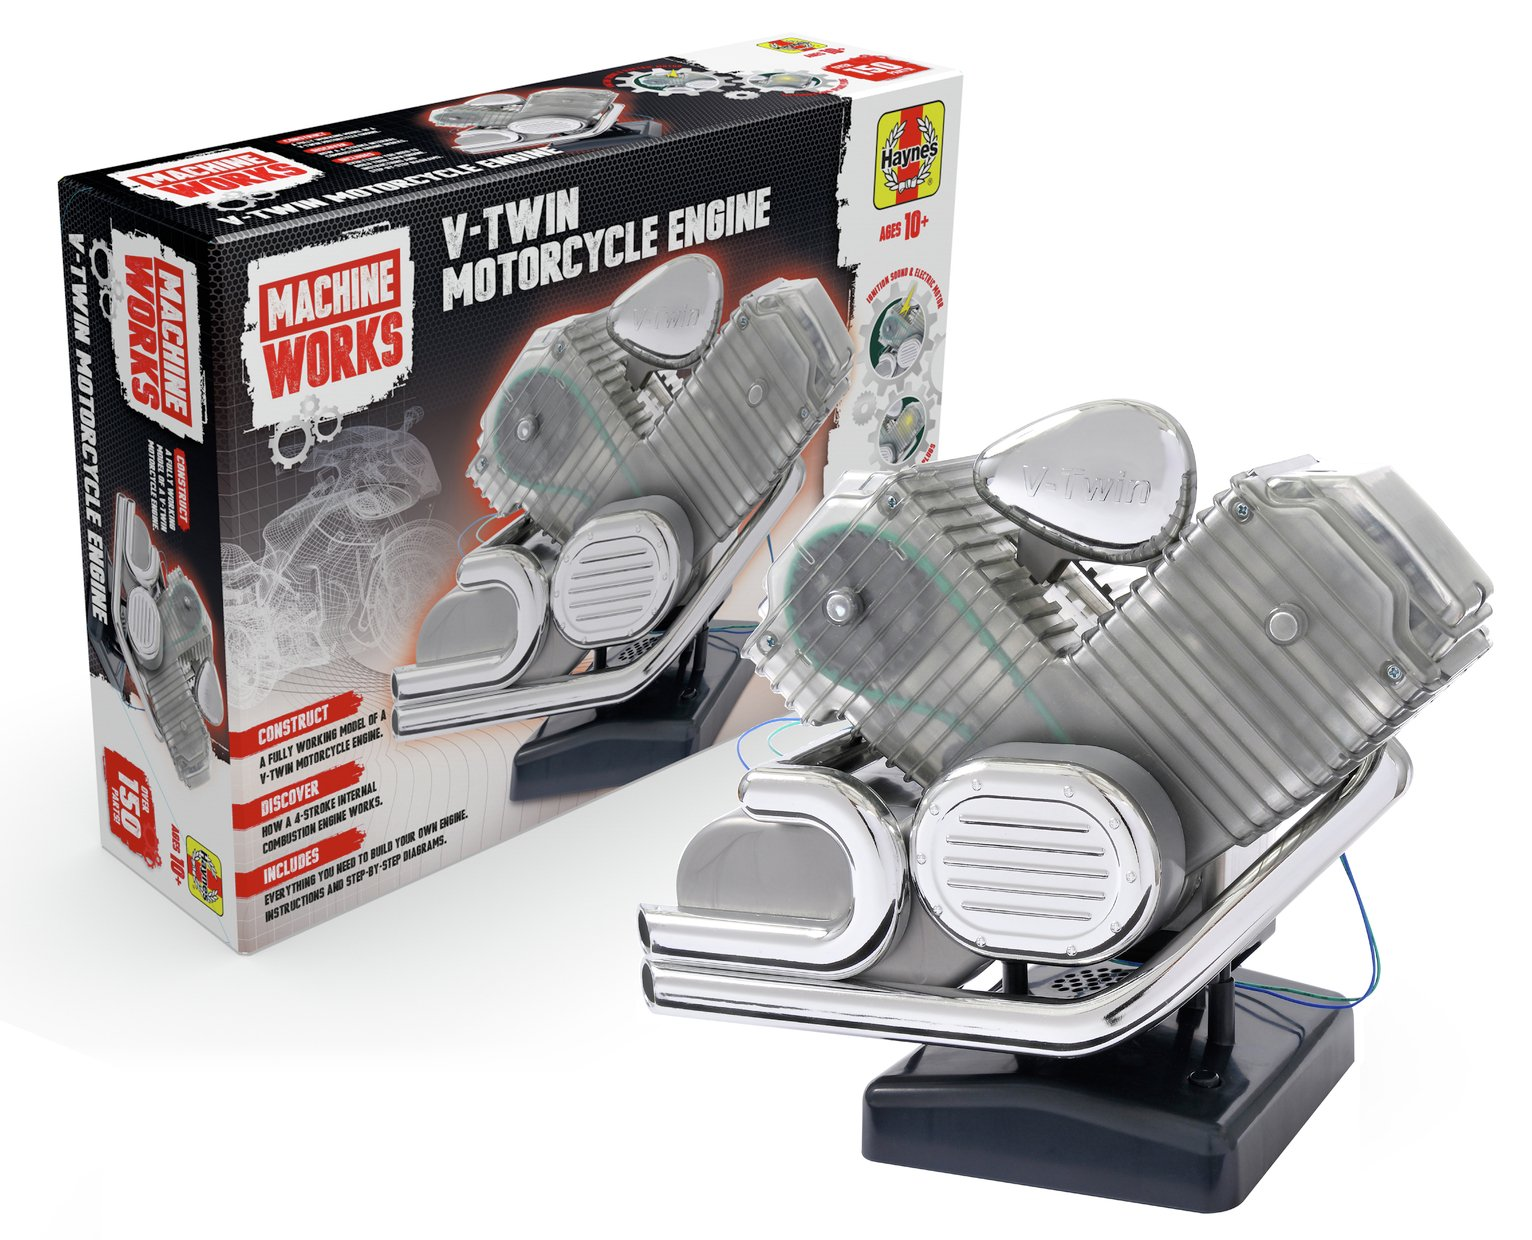 hight resolution of haynes v twin motorcycle engine kit 5433115 argos price tracker pricehistory co uk